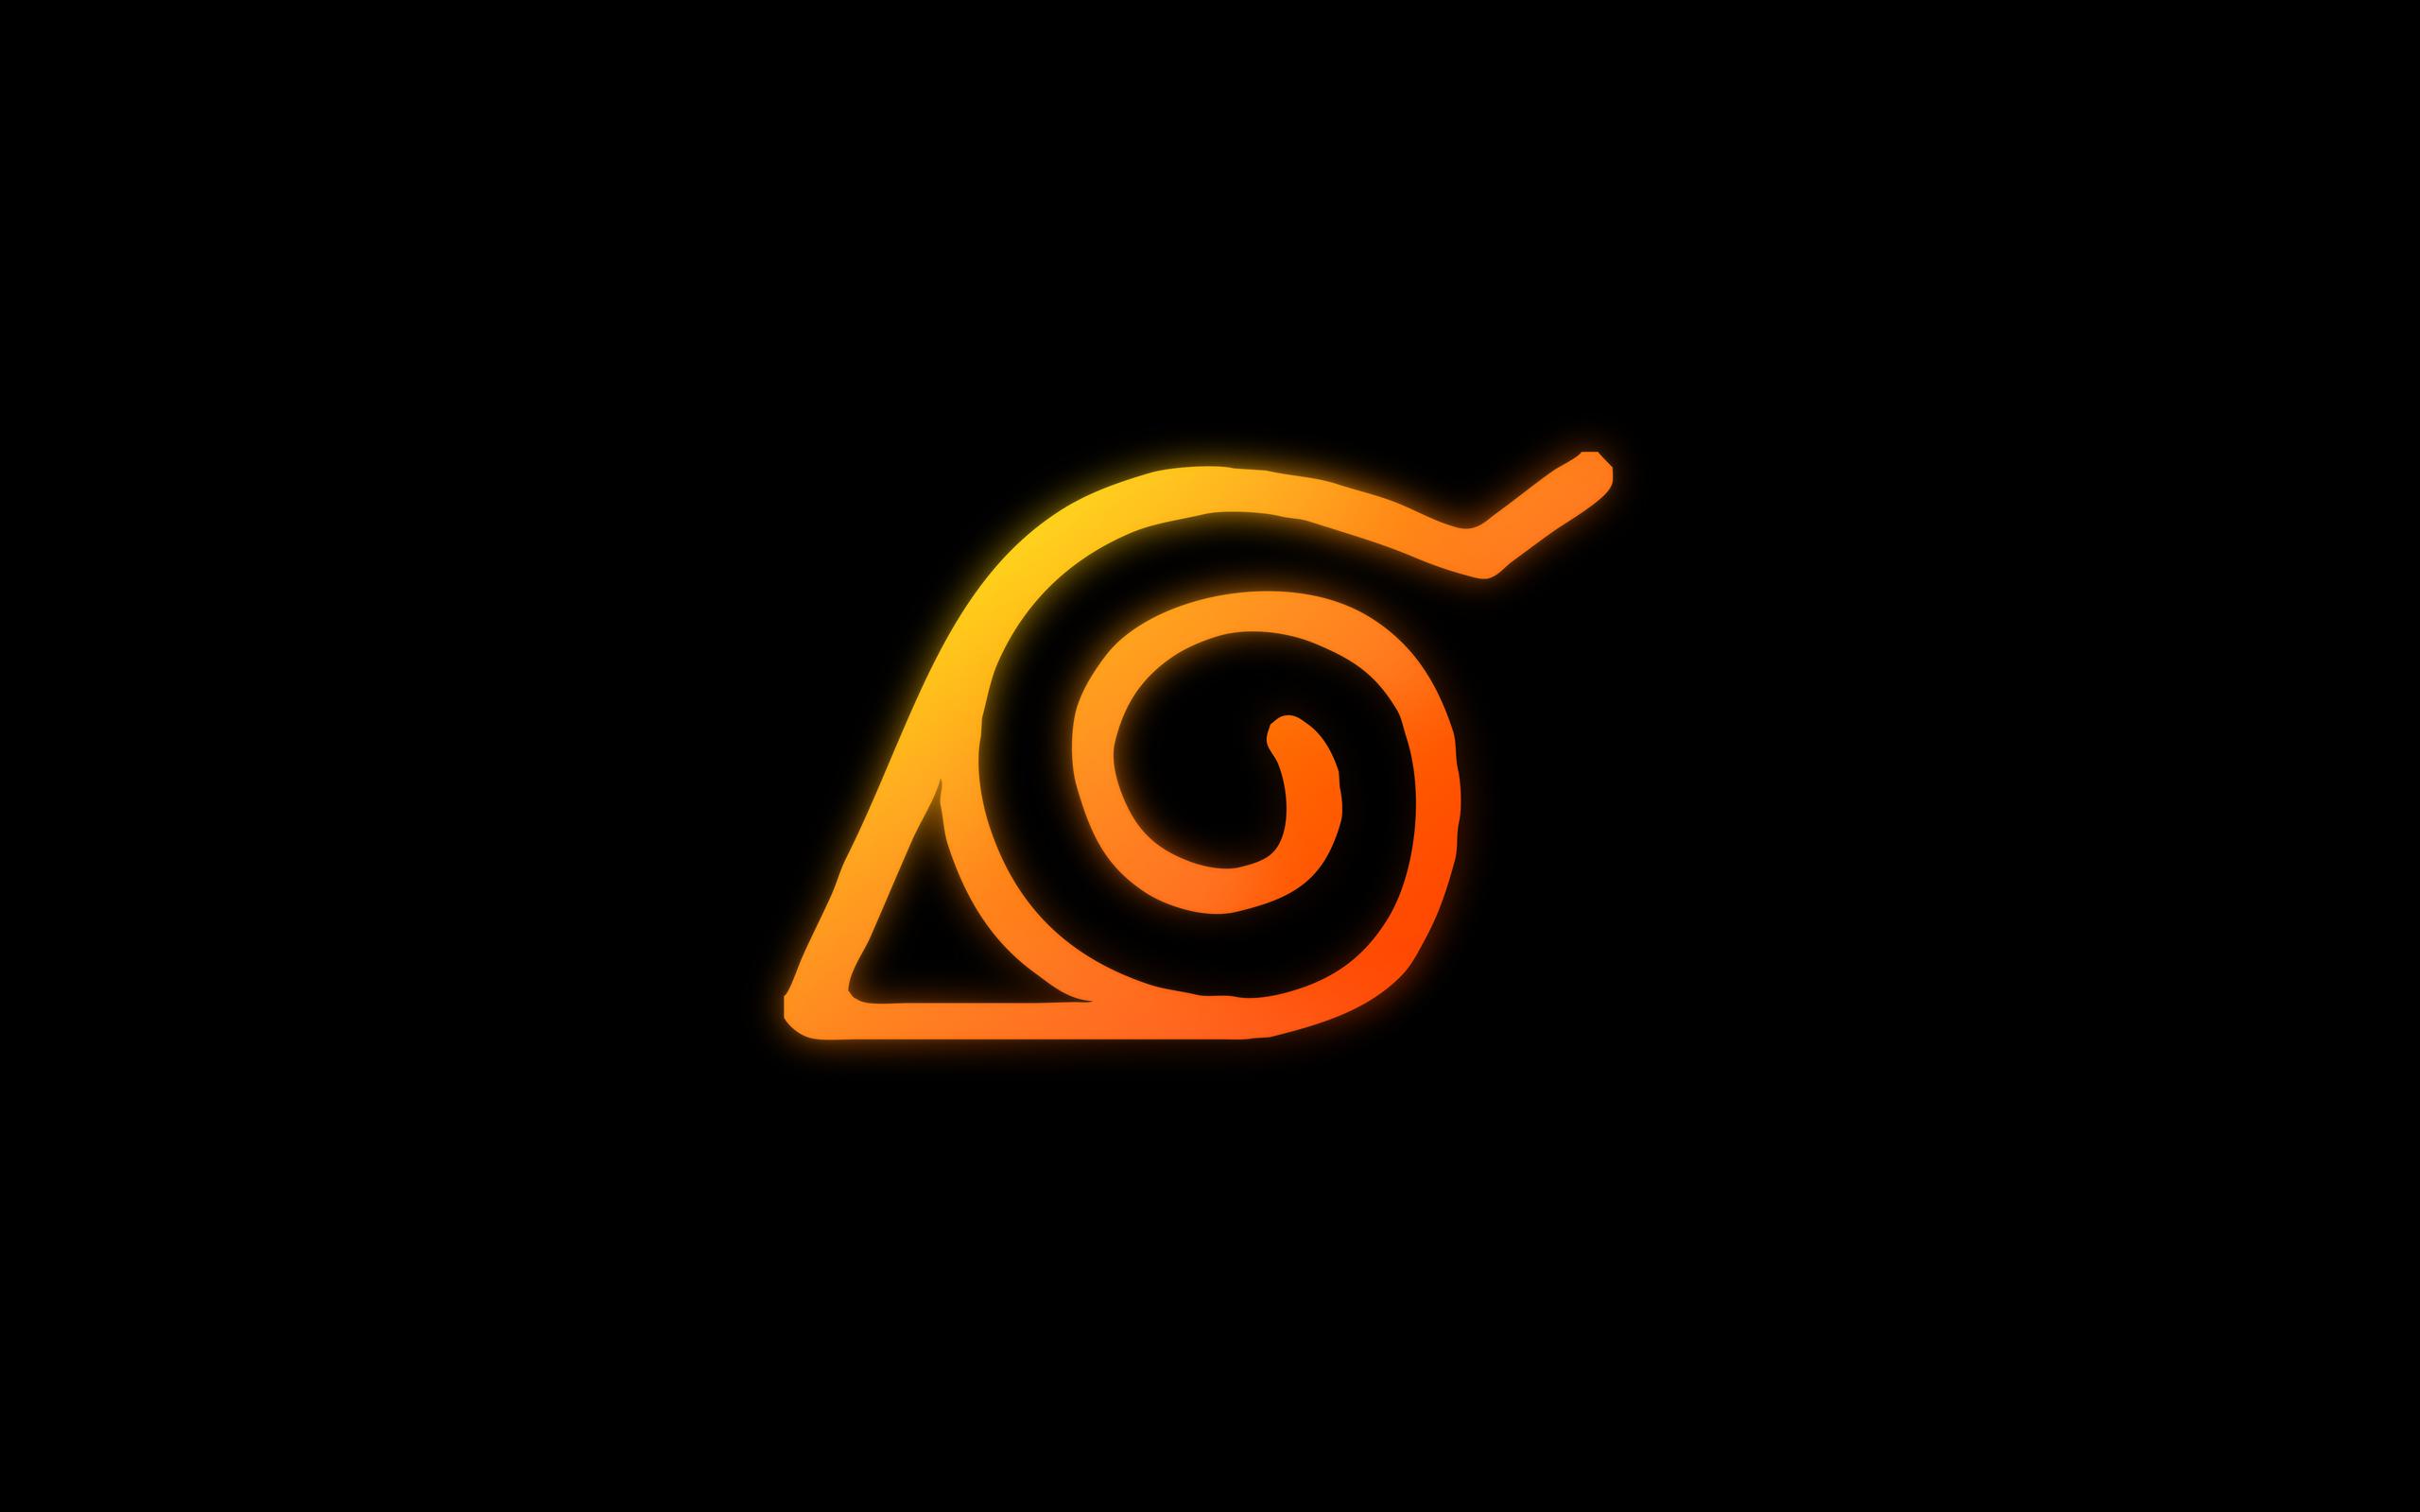 naruto-logo-anime-8k-qz.jpg